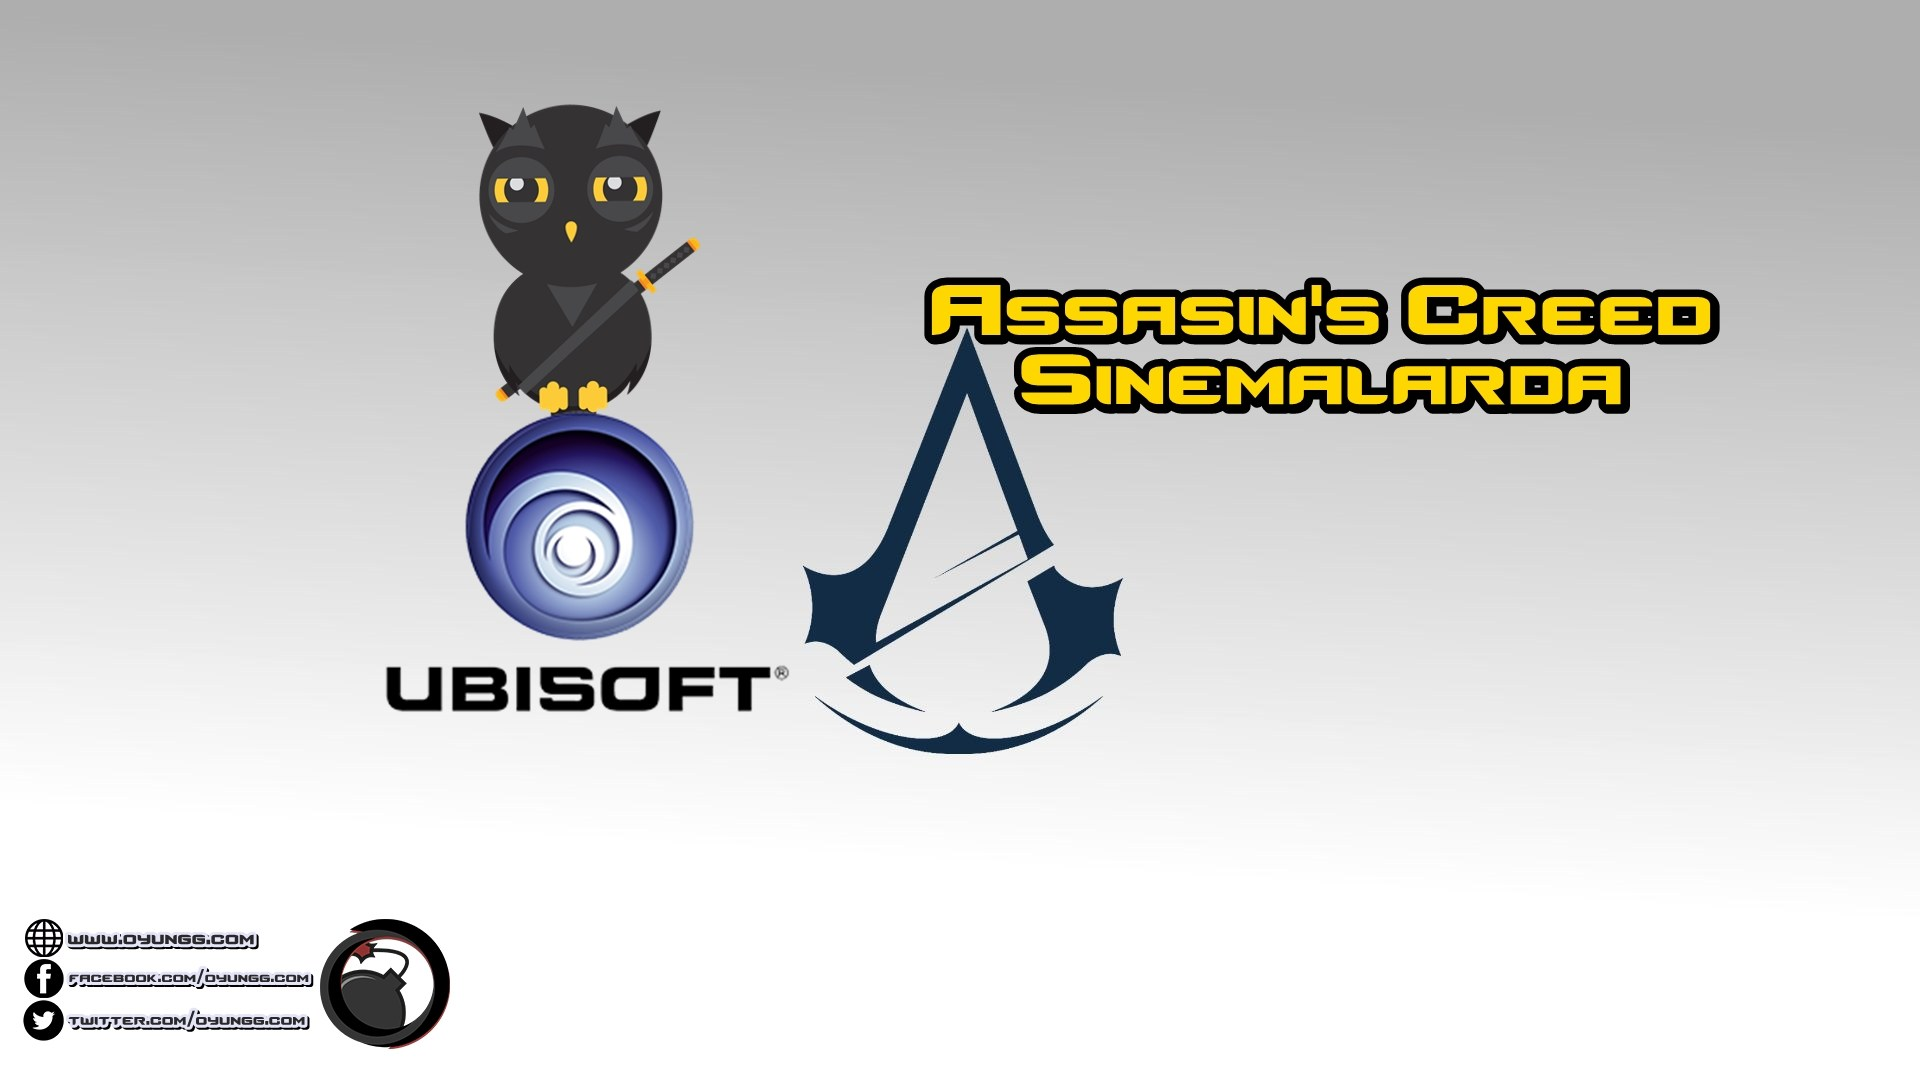 Assassin's Creed 1 Hafta Sonra Sinemalarda!